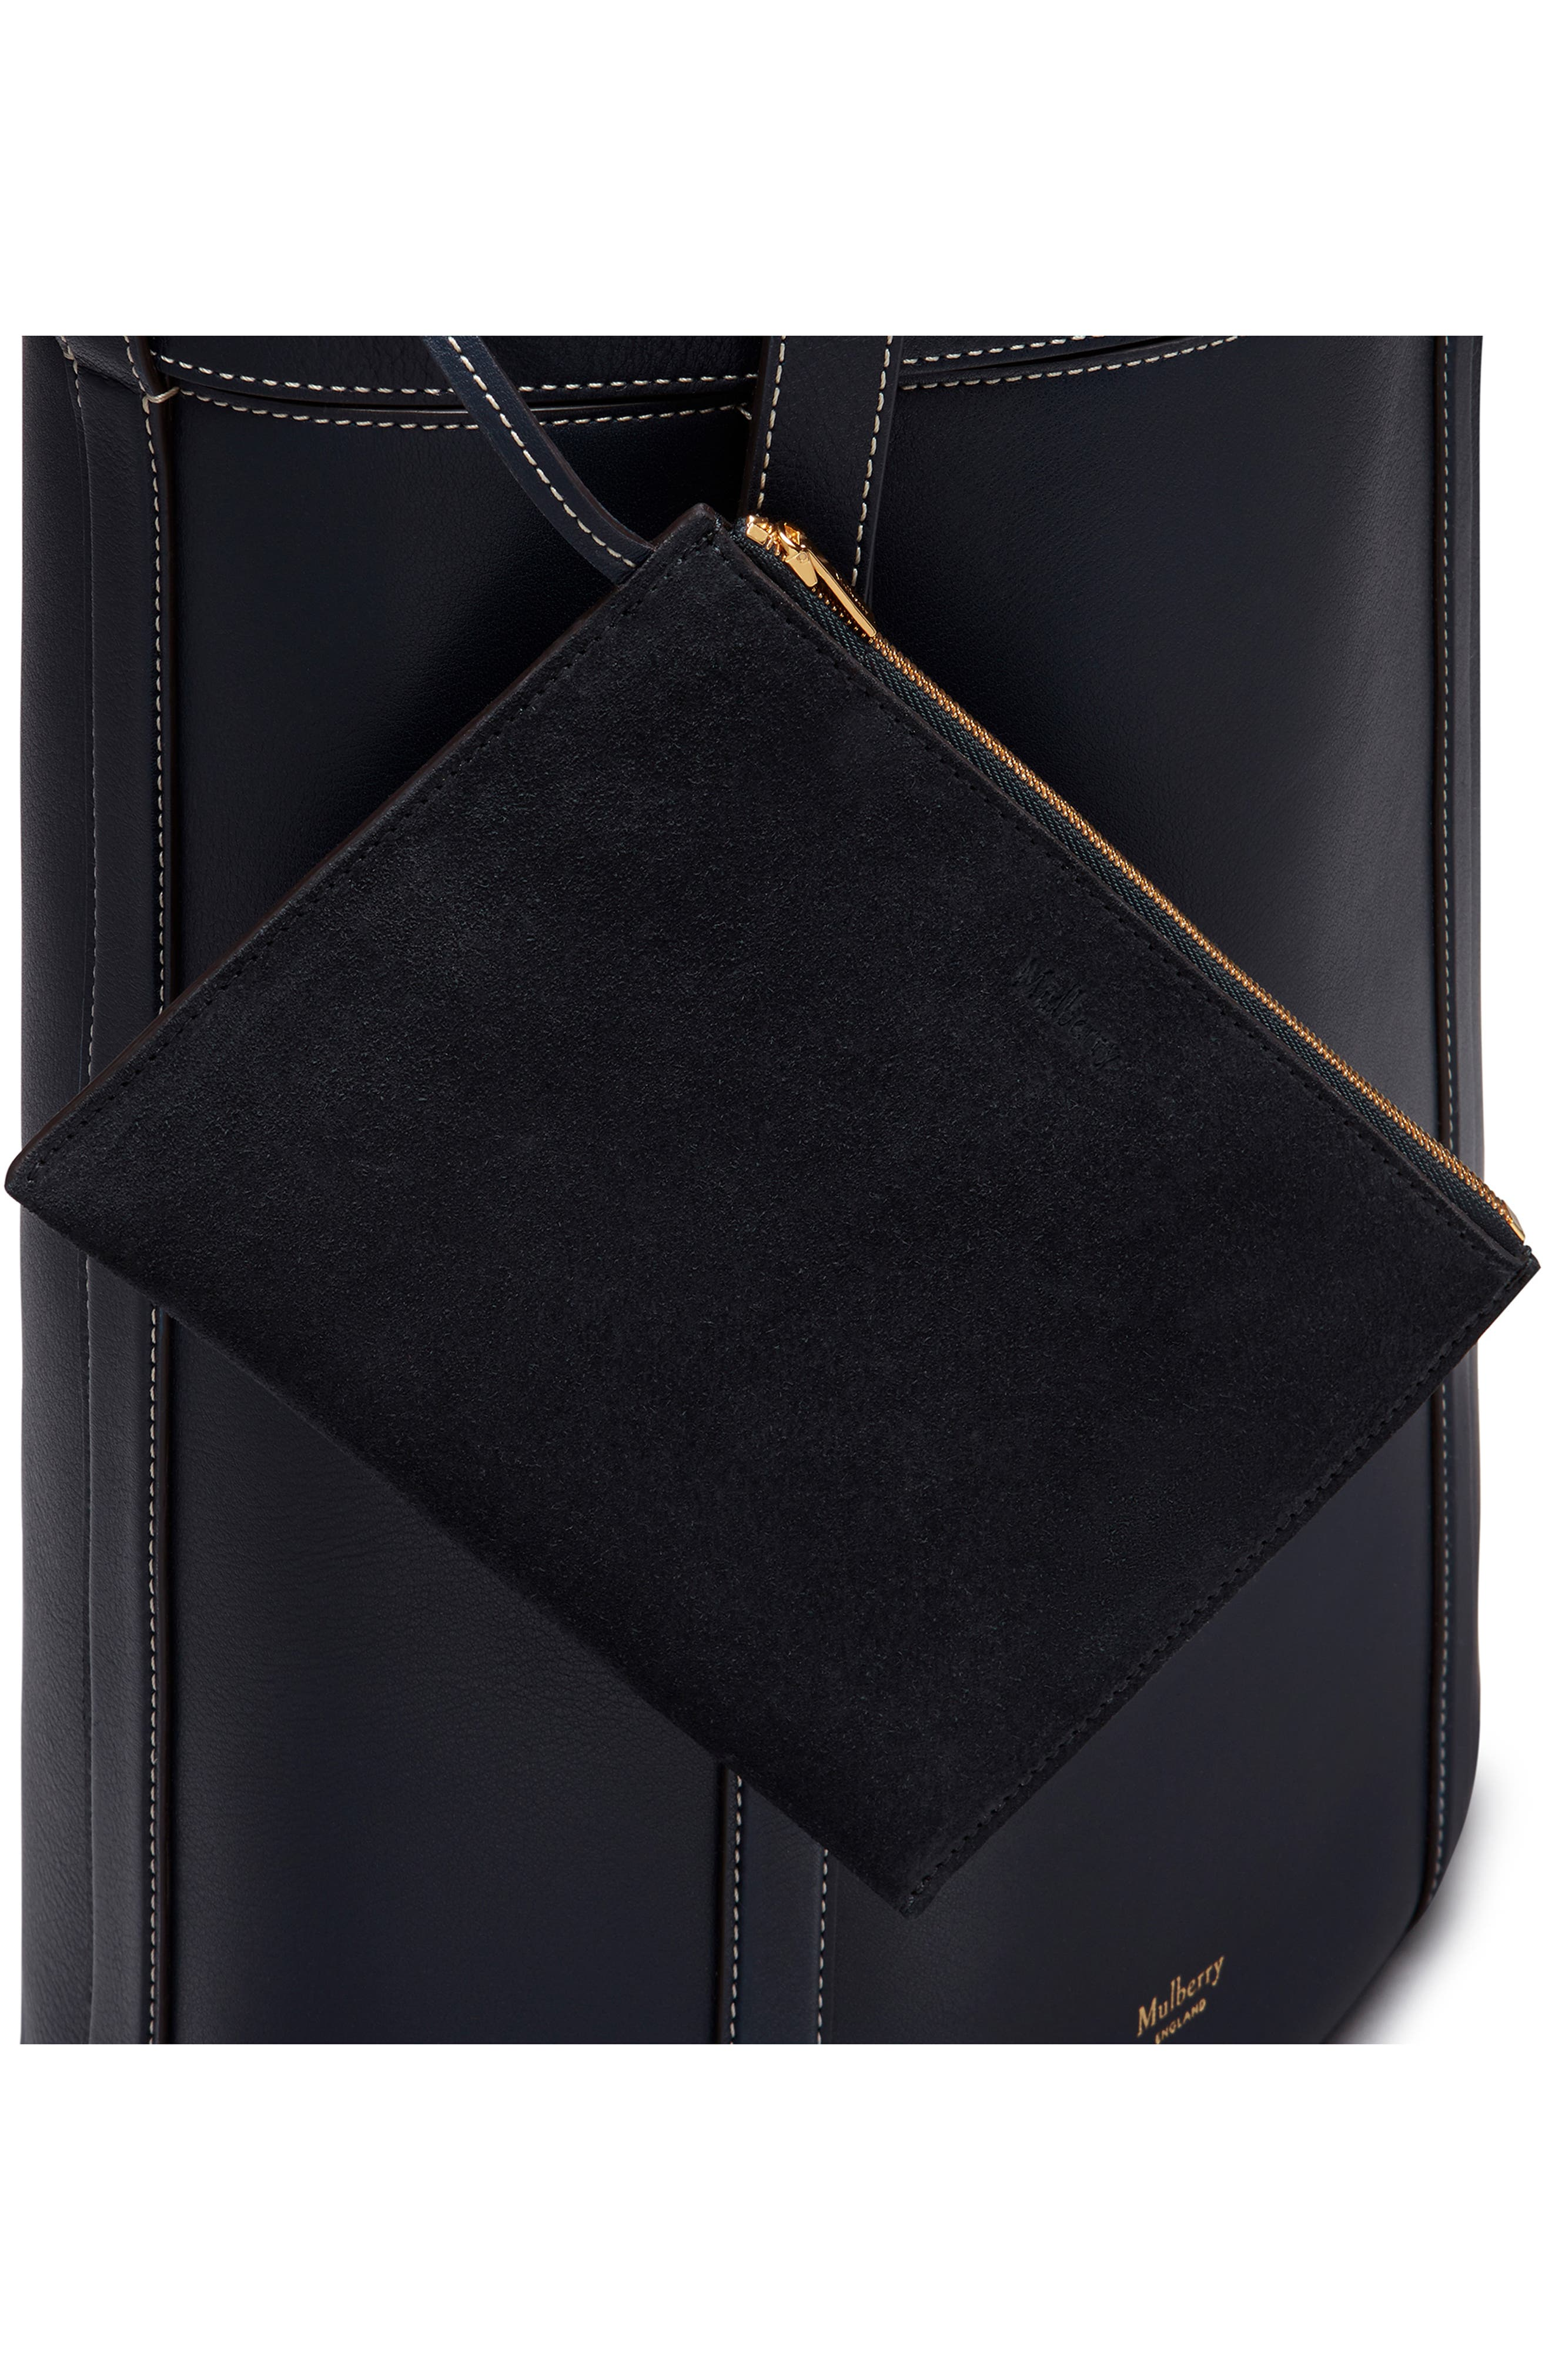 Small Wilton Leather Bucket Bag,                             Alternate thumbnail 5, color,                             MIDNIGHT